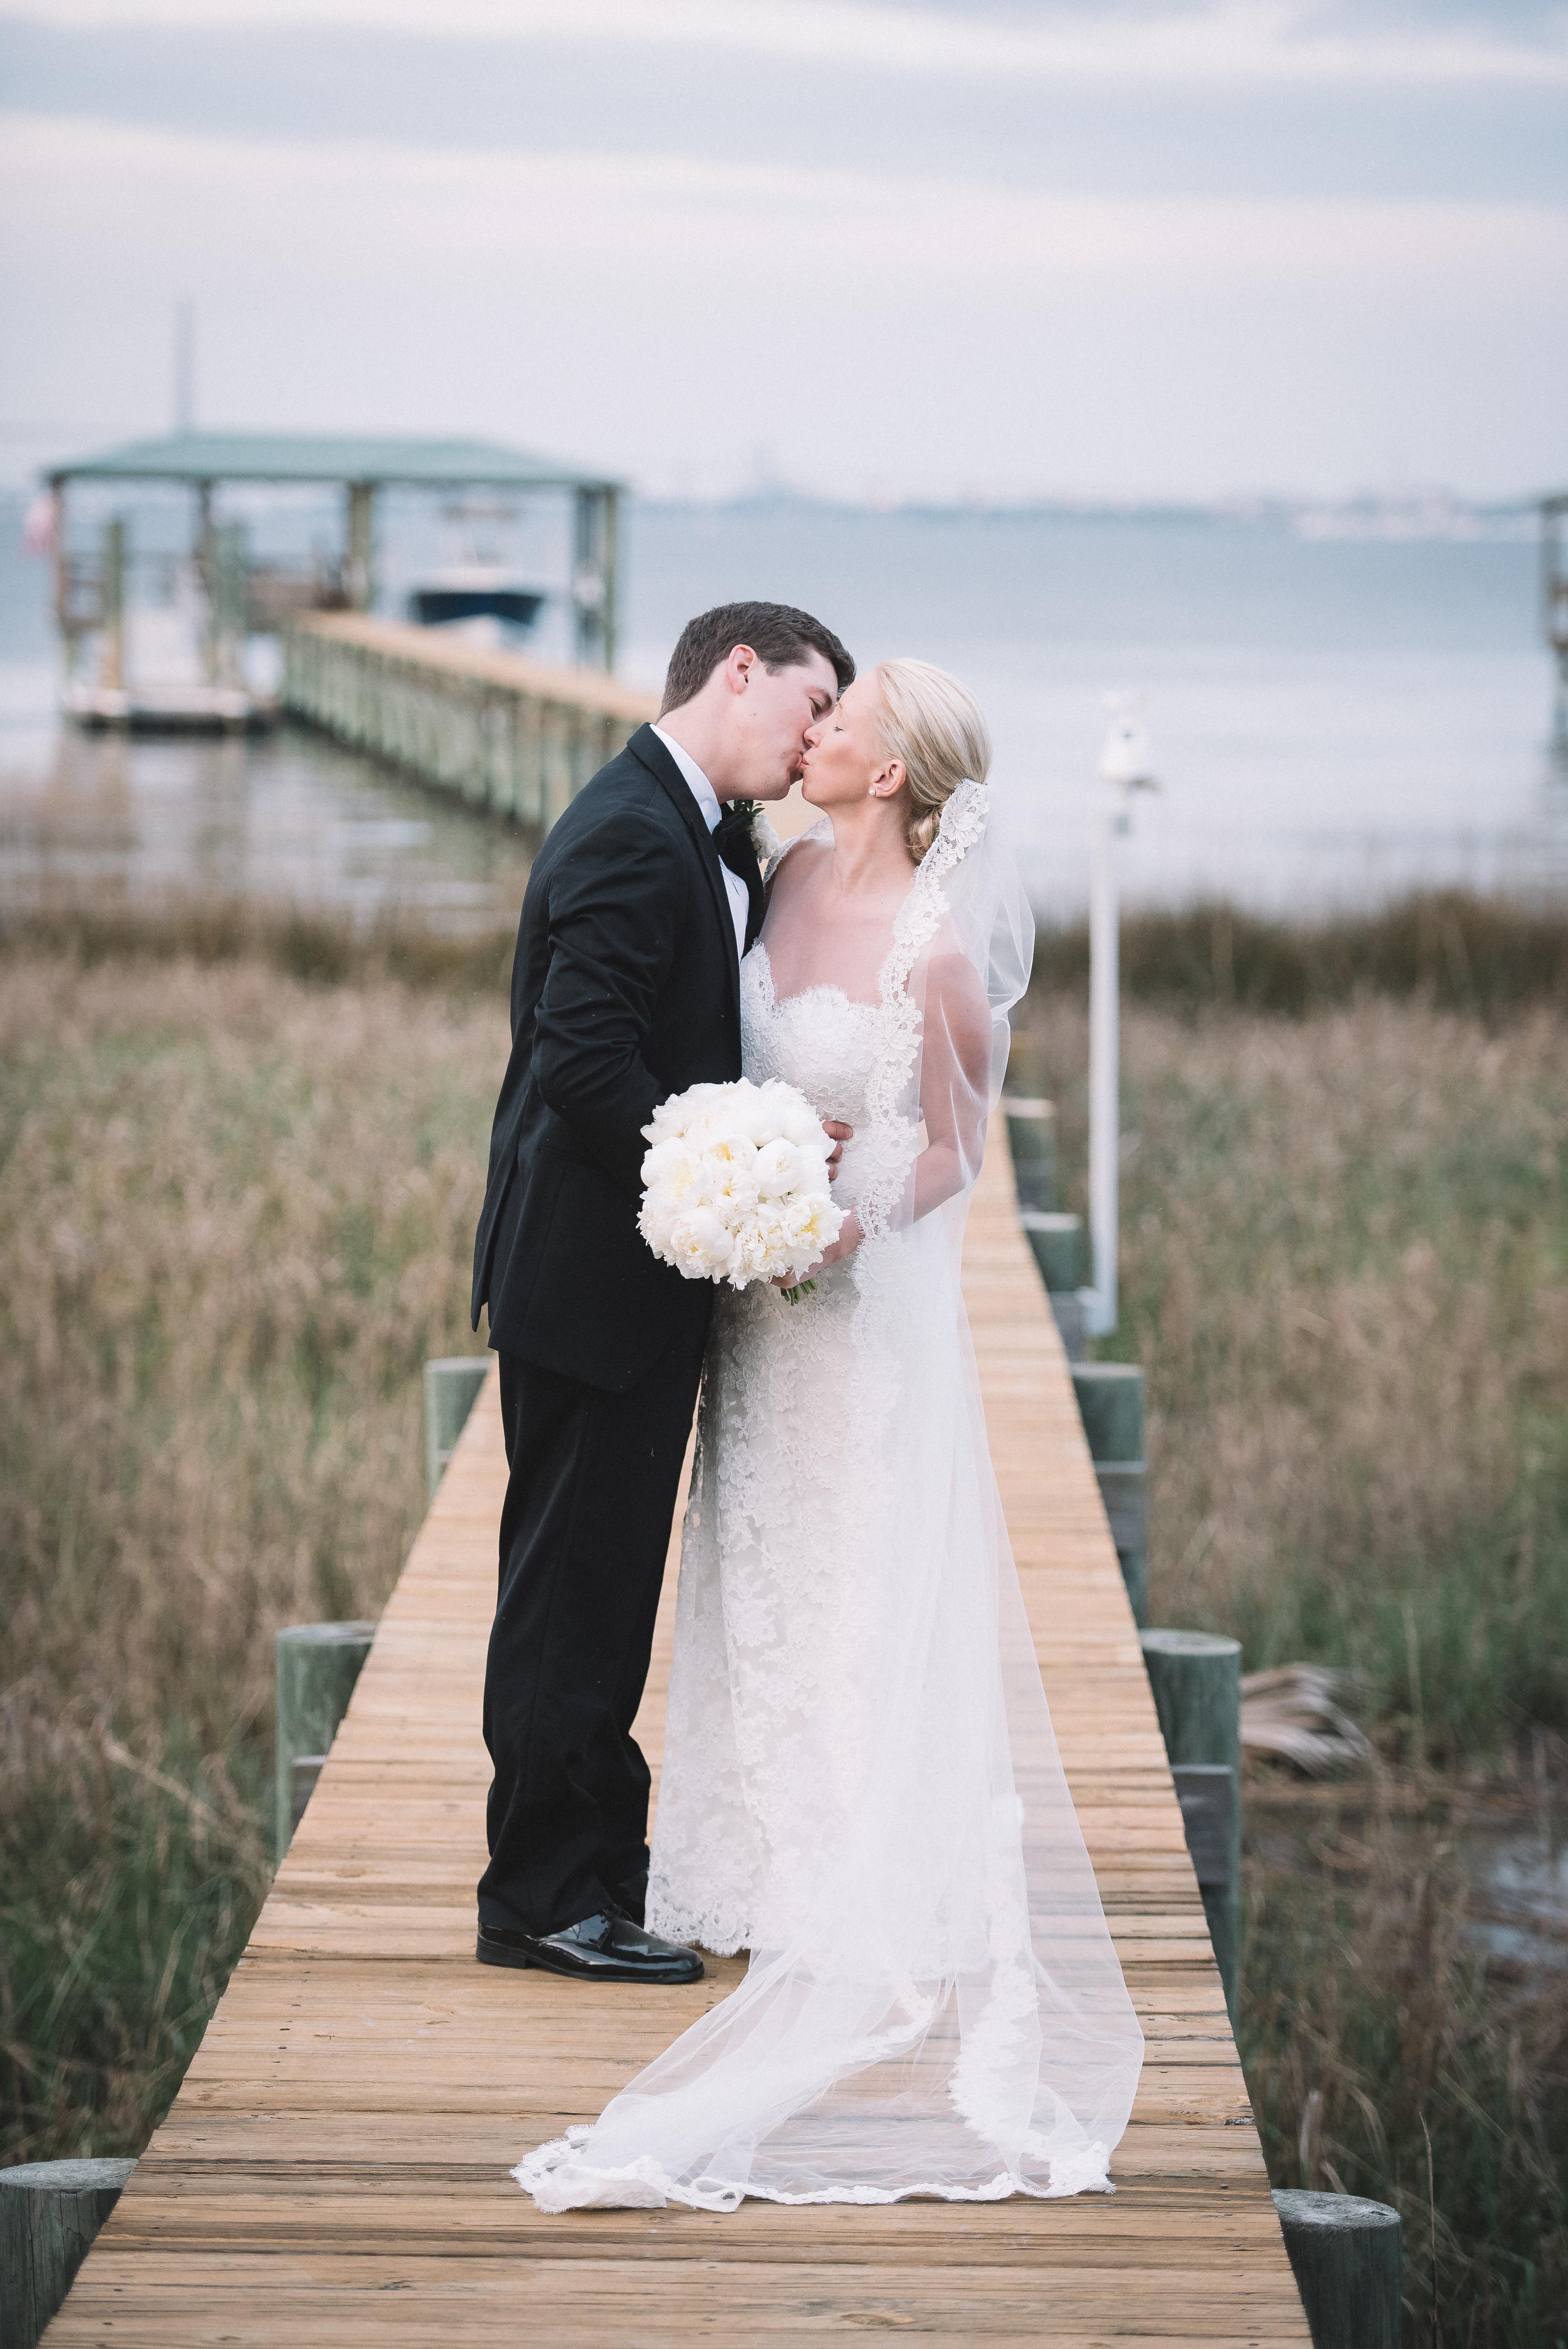 Charleston Wedding Photographers Virgil Bunao Hayes and Weston | Charleston Wedding | Part One